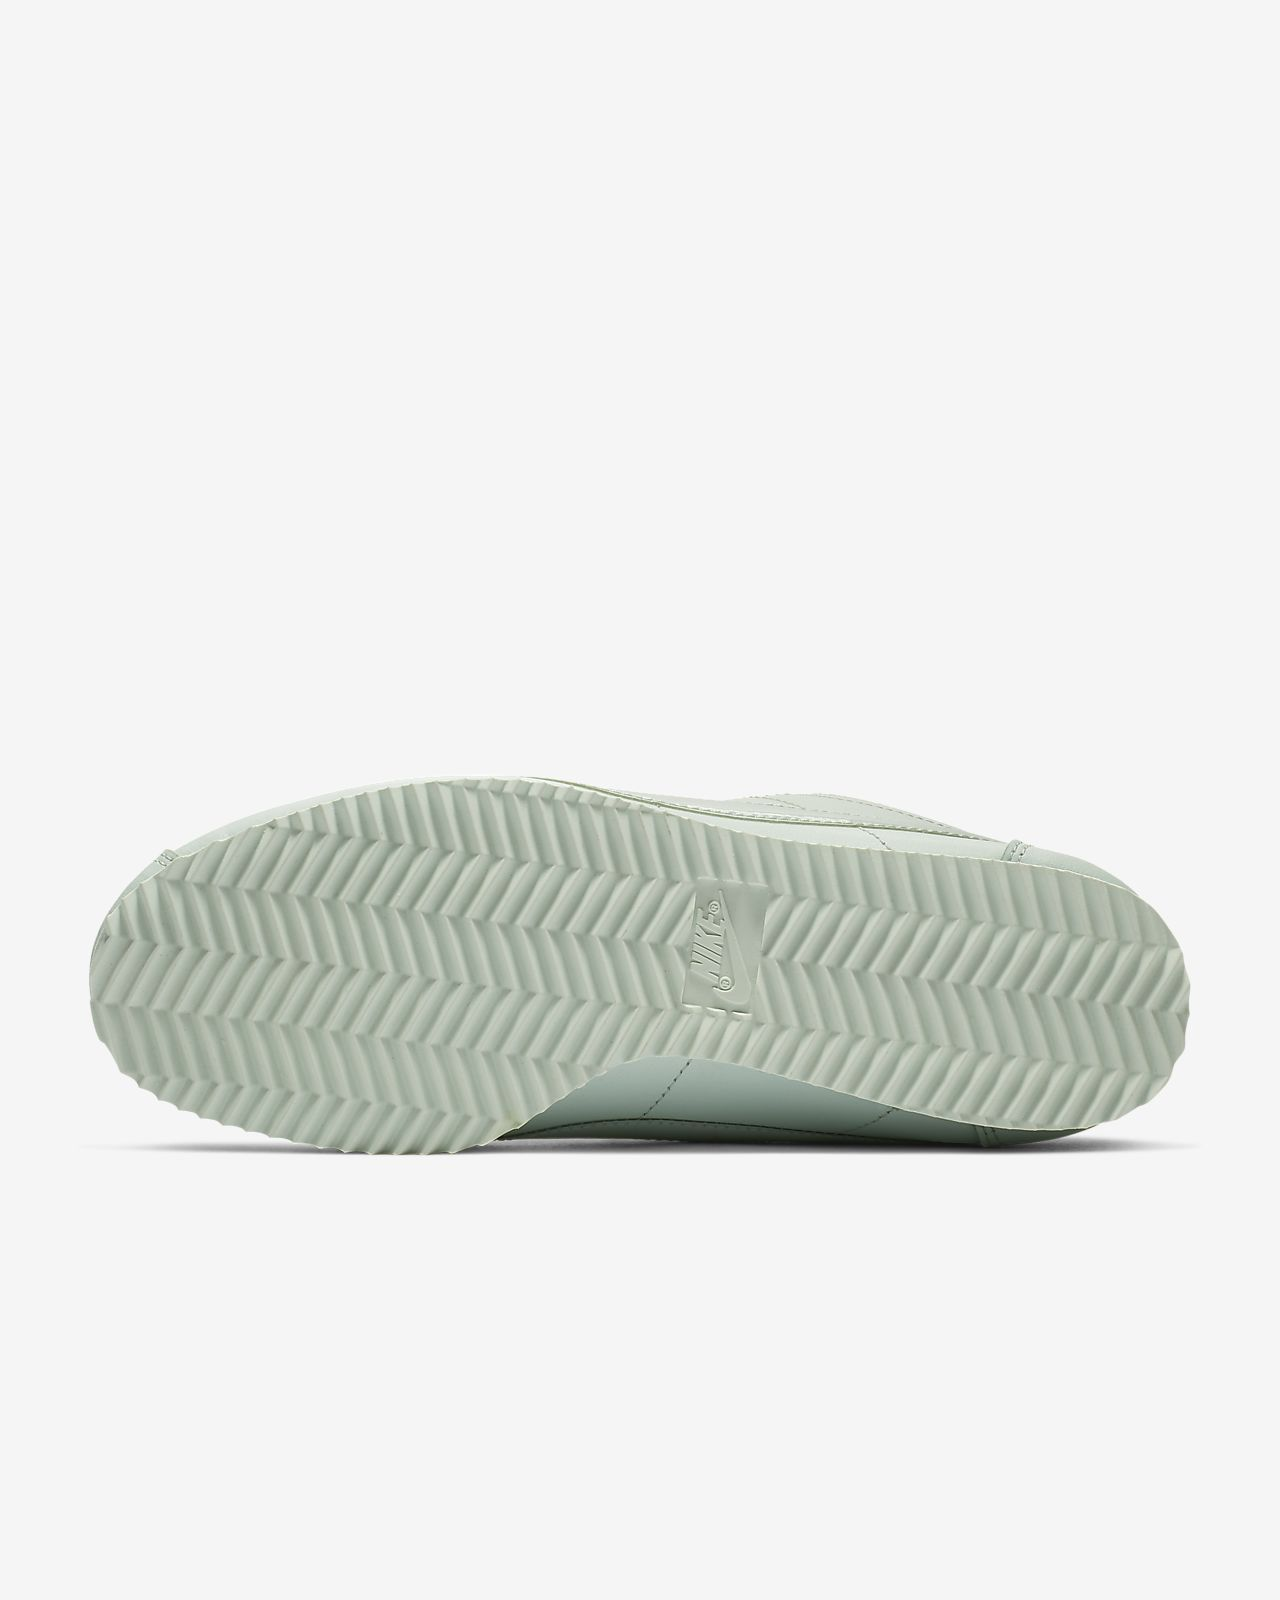 f349f269656 Nike Classic Cortez Premium Women s Shoe. Nike.com AU